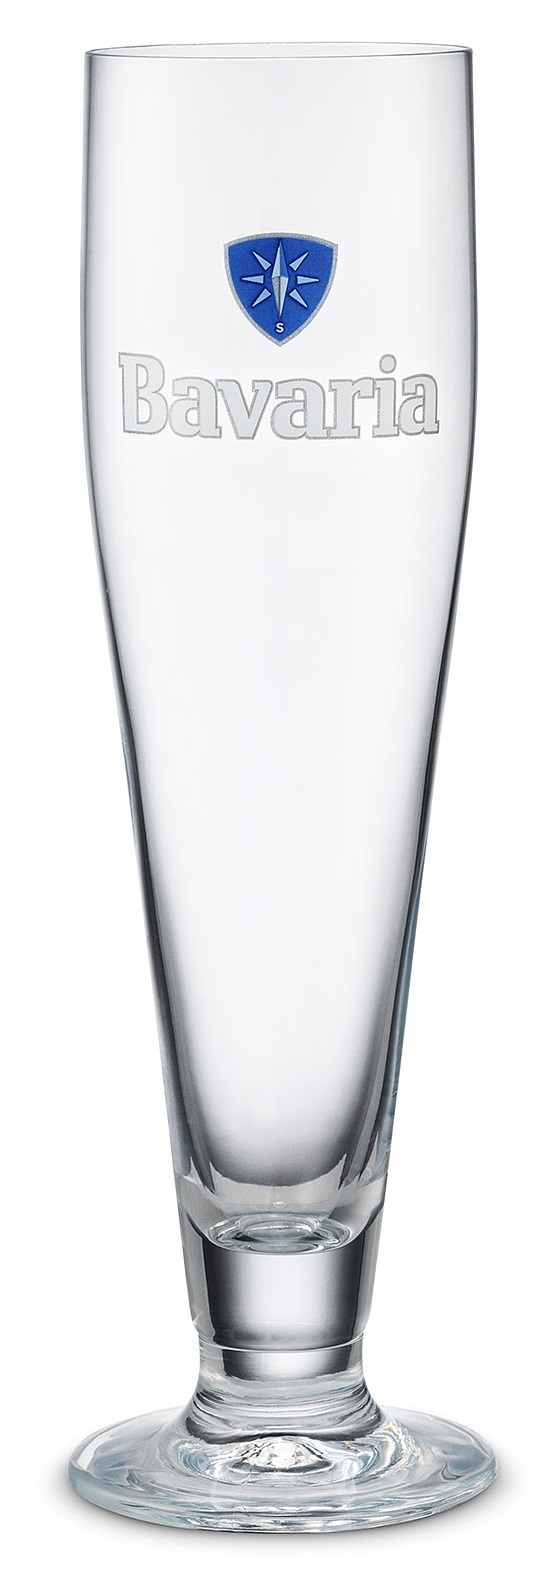 Bavaria voetglas